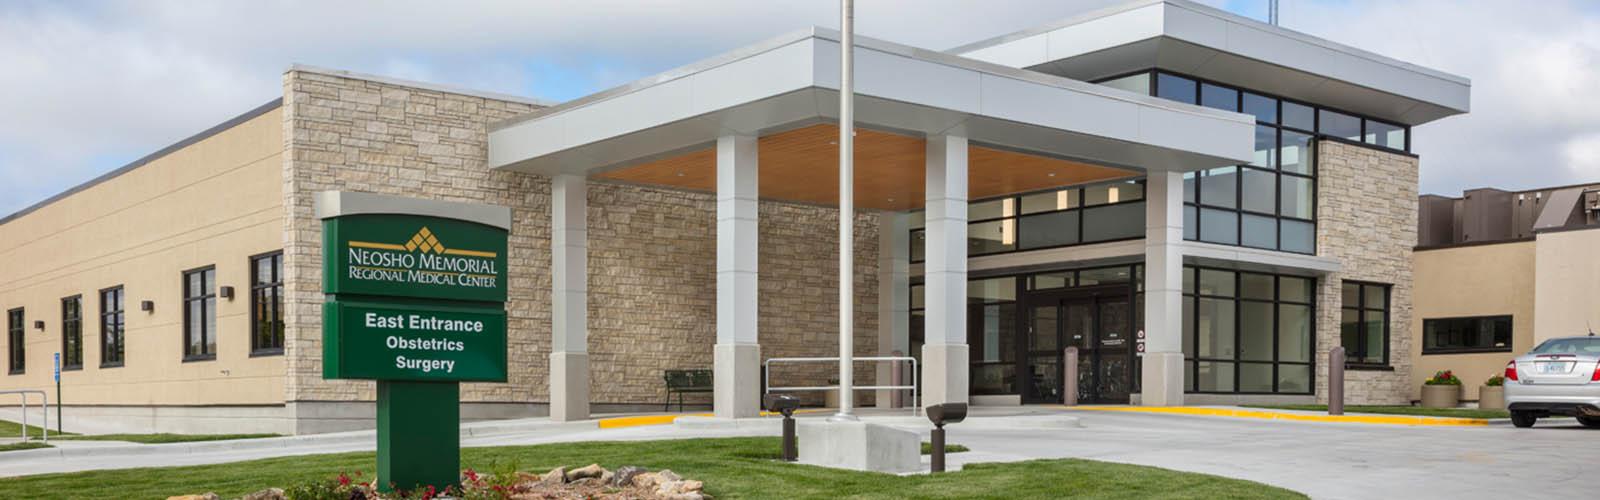 Neosho Memorial Medical Center